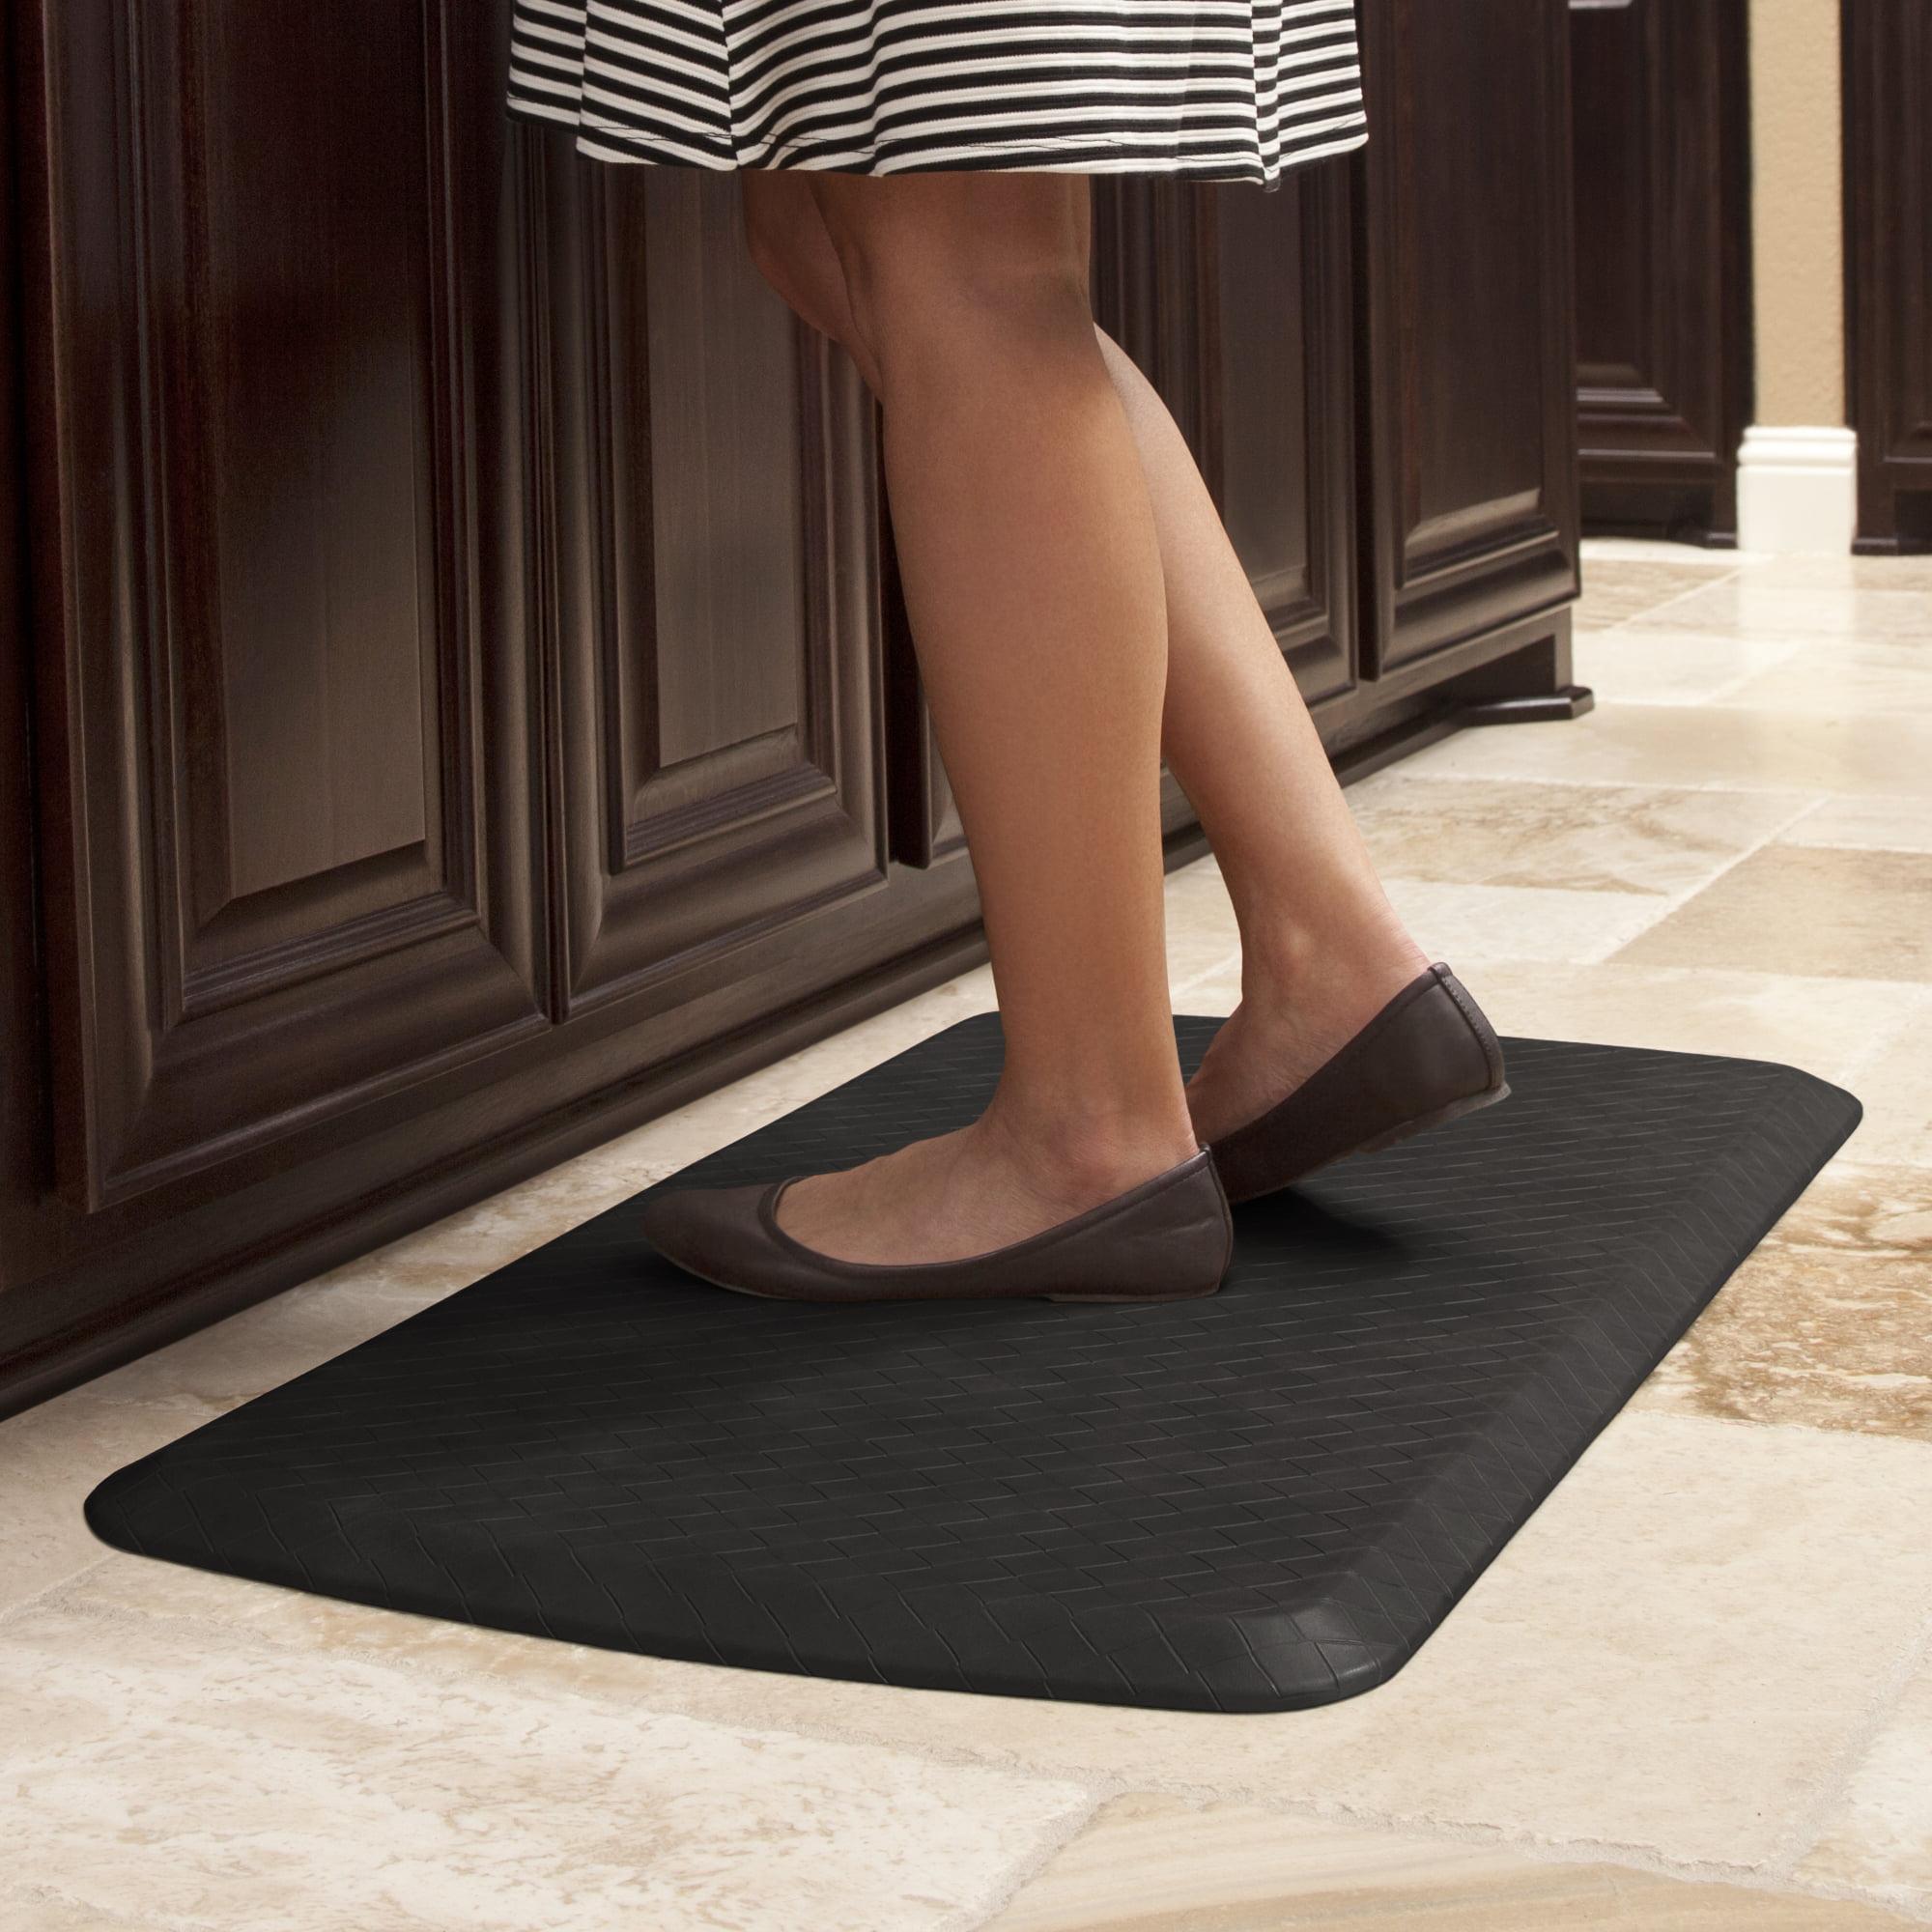 Gelpro Elite Anti Fatigue Gel Foam Kitchen Comfort Mat 20x36 Basketweave Black Walmart Com Walmart Com